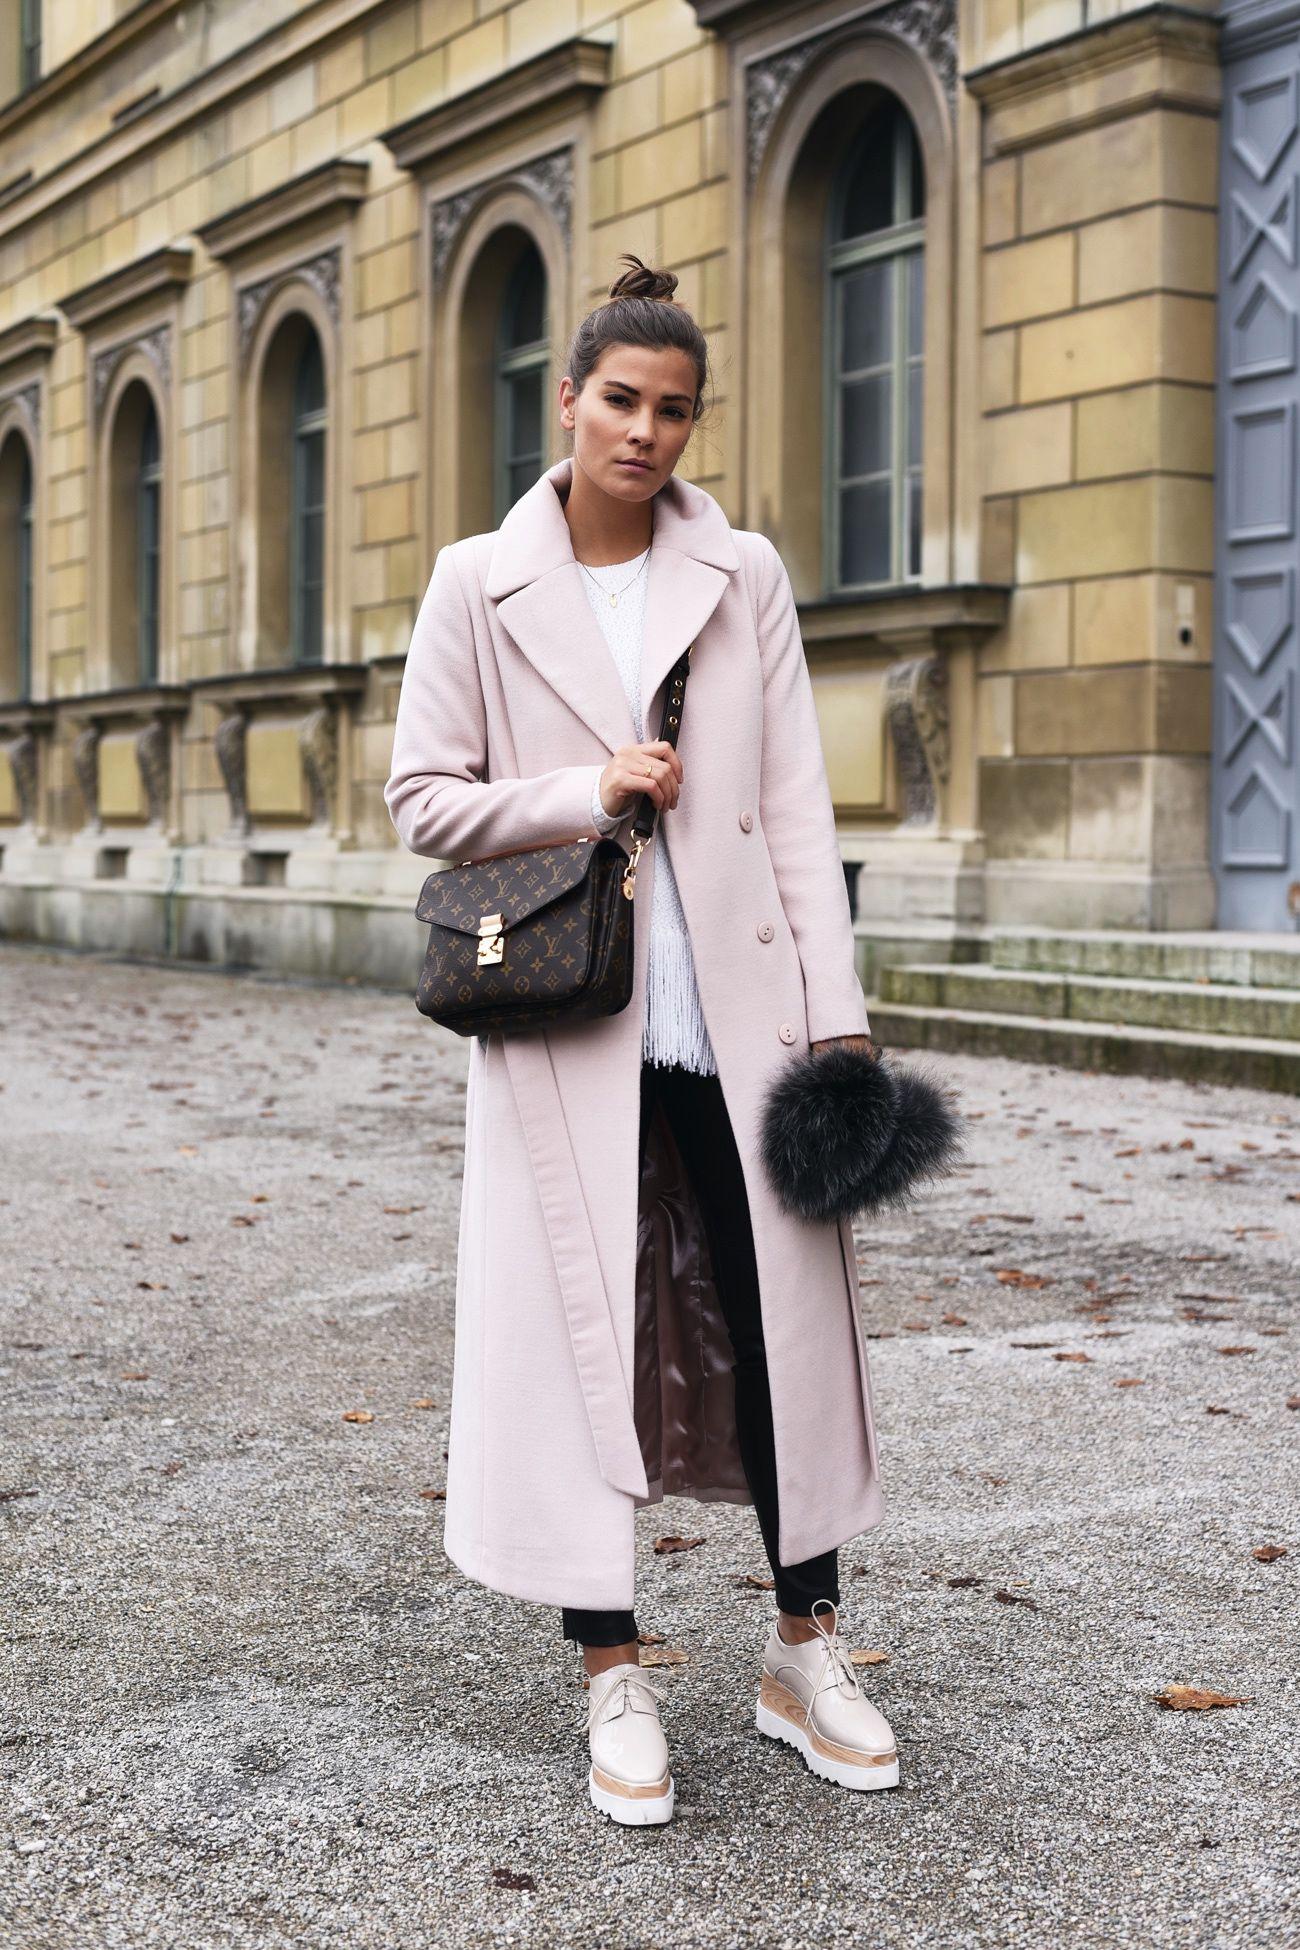 Outfit Pink Long Coat Platform Shoes Louis Vuitton Pochette Sonne Anne Sf8008 Camel Premium Lady Comfort Casual Leather Sandal Pullover Mit Fransen Stella Mccartner Blogger Streetstyle Fashiioncarpet